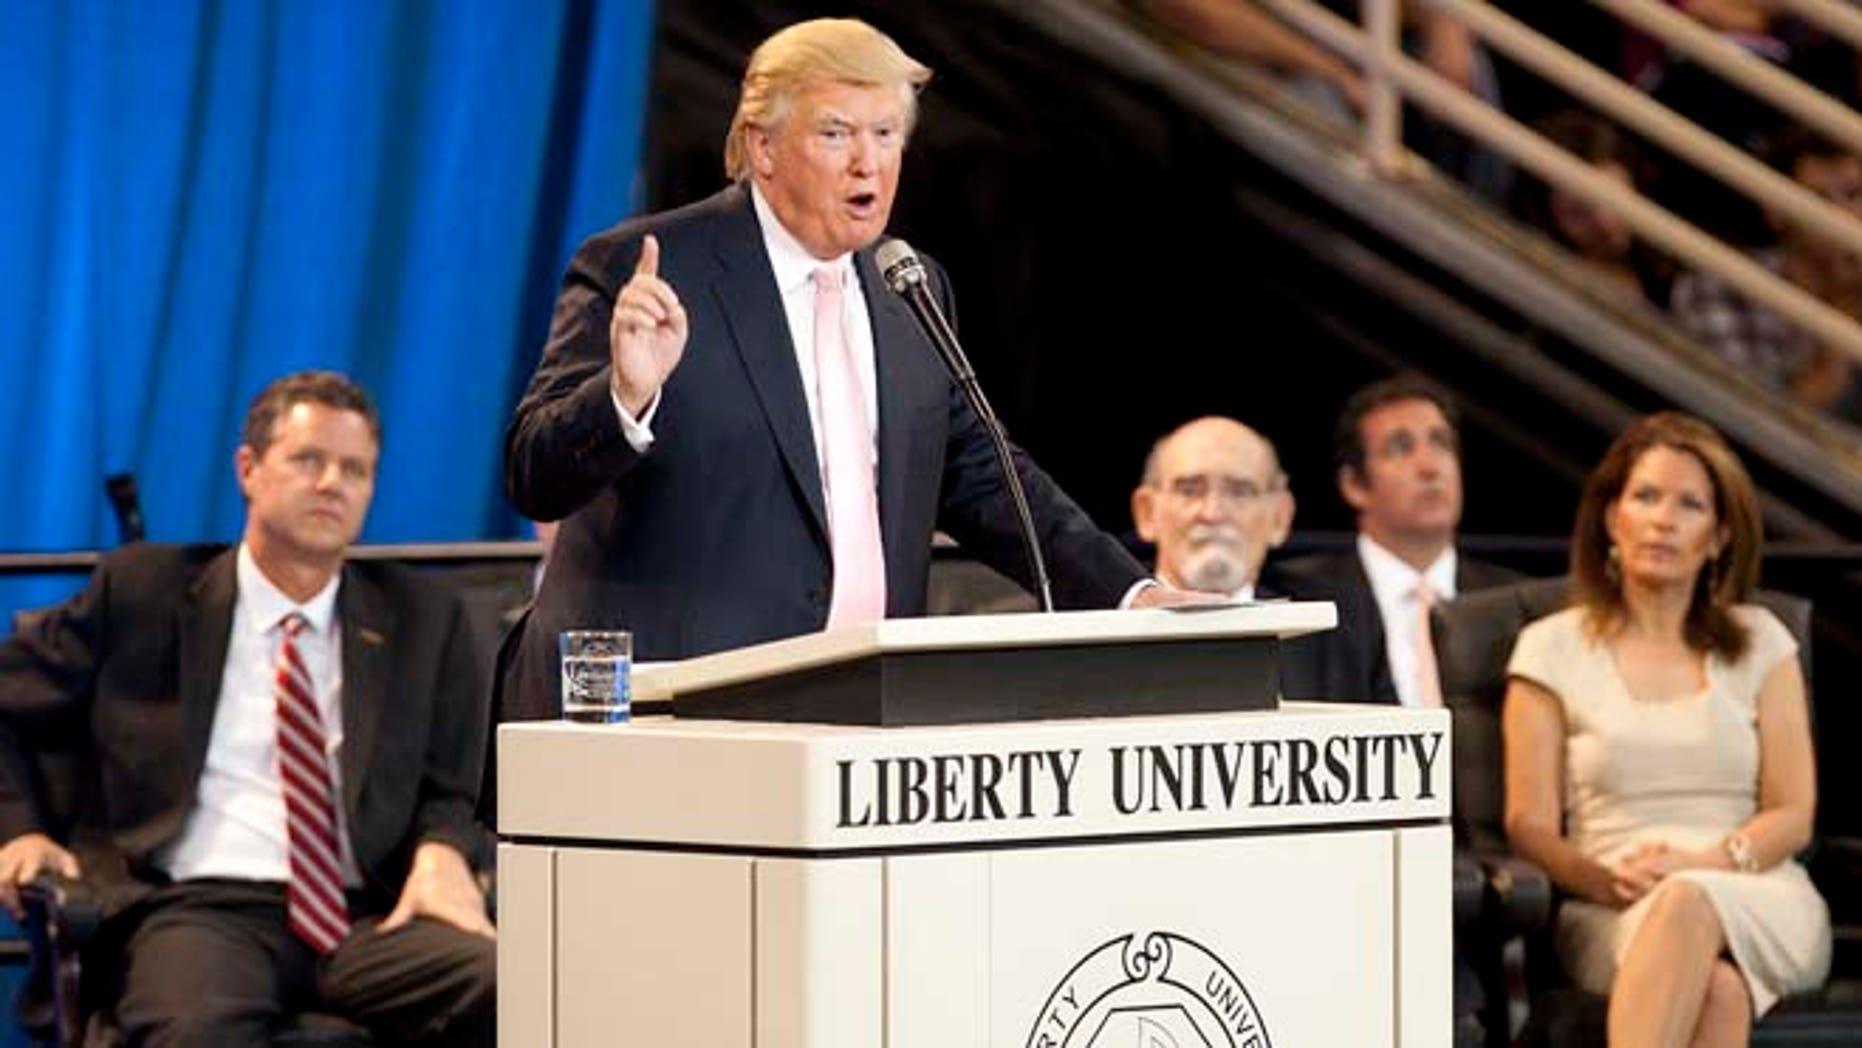 Sept. 24, 2012: Donald Trump speaks at Convocation at Liberty University in Lynchburg, Va.